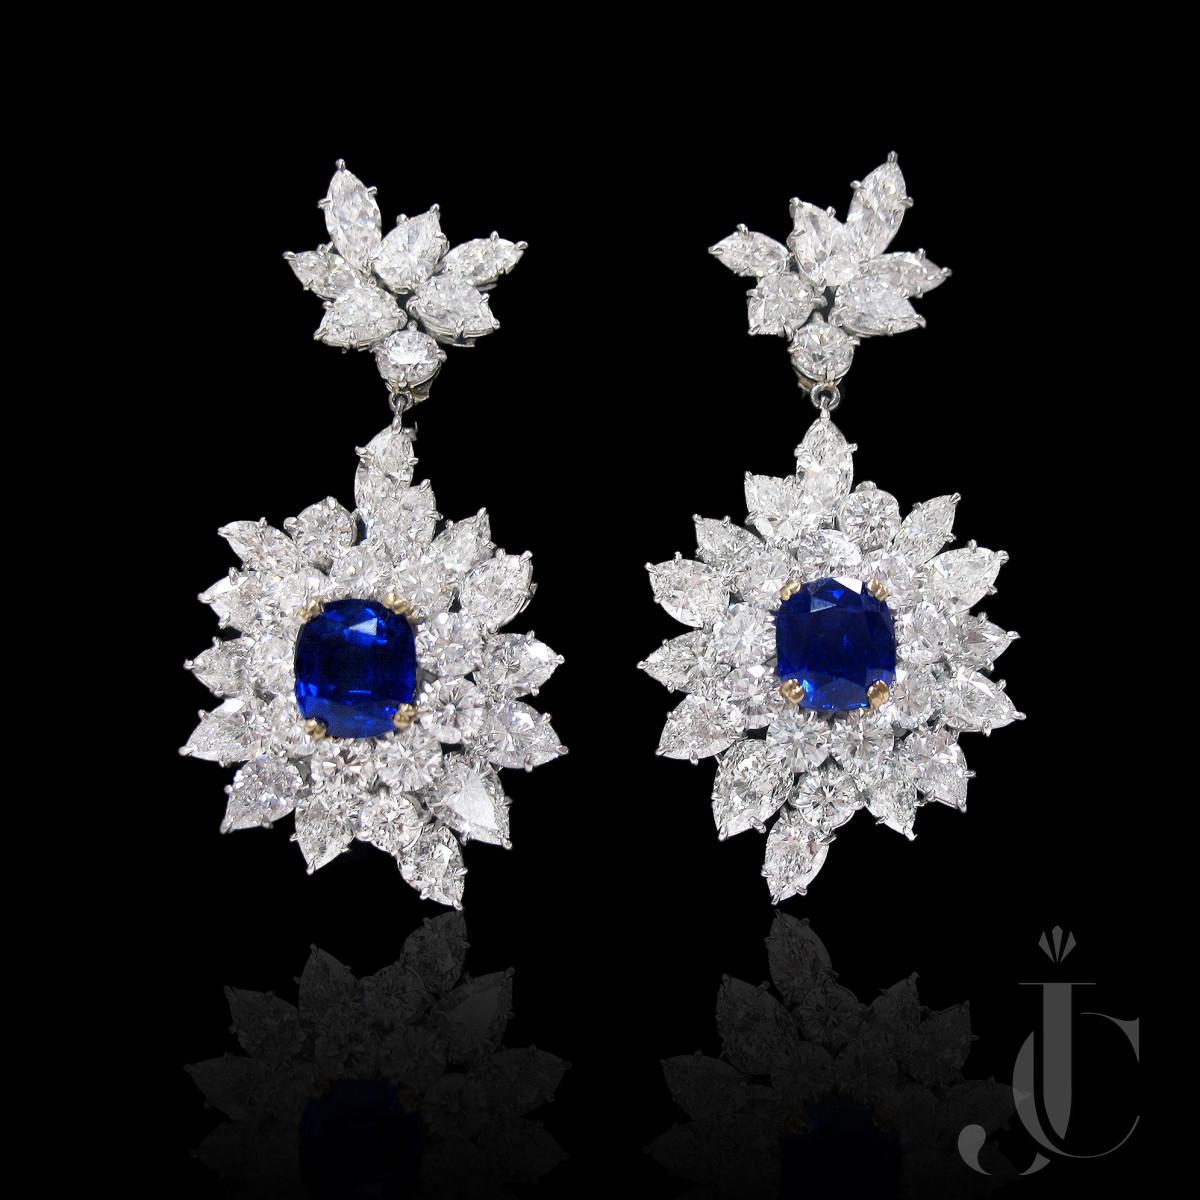 Harry Winston Platinum Sapphire and Diamond Earrings, circa 1965